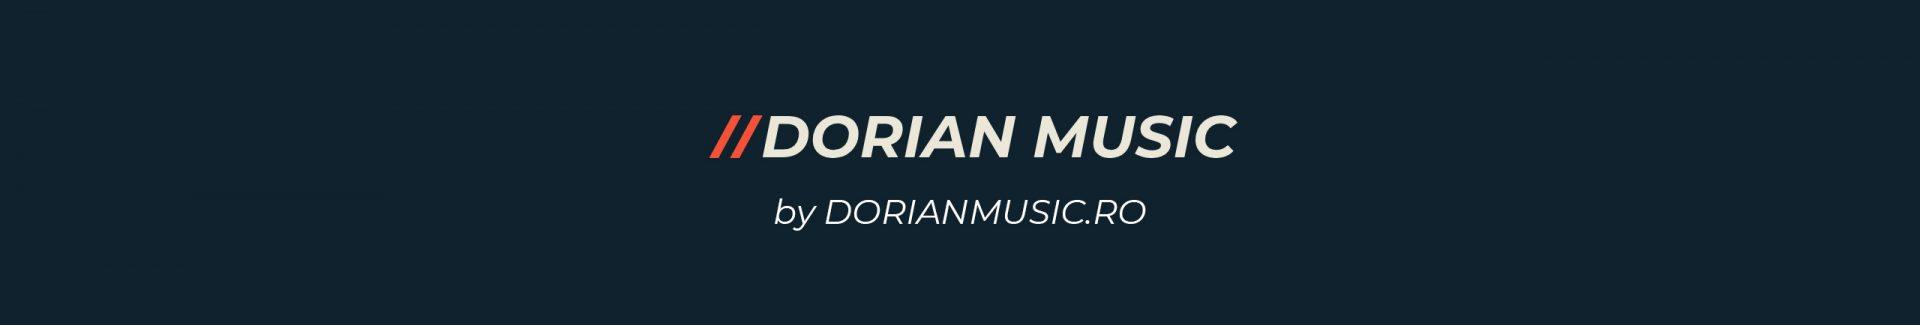 Dorian Music